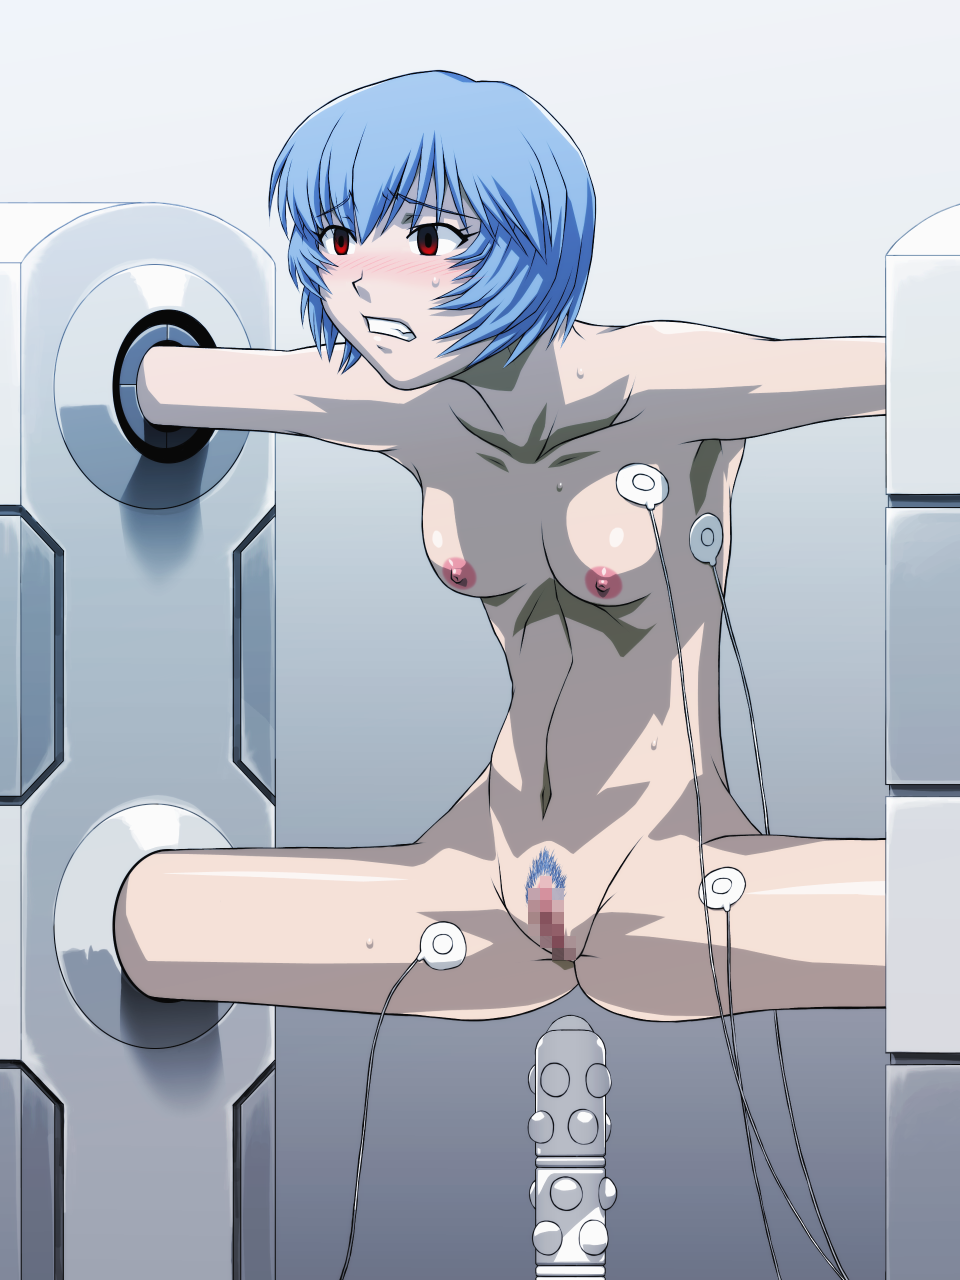 Machine hentai xxx erotic clip